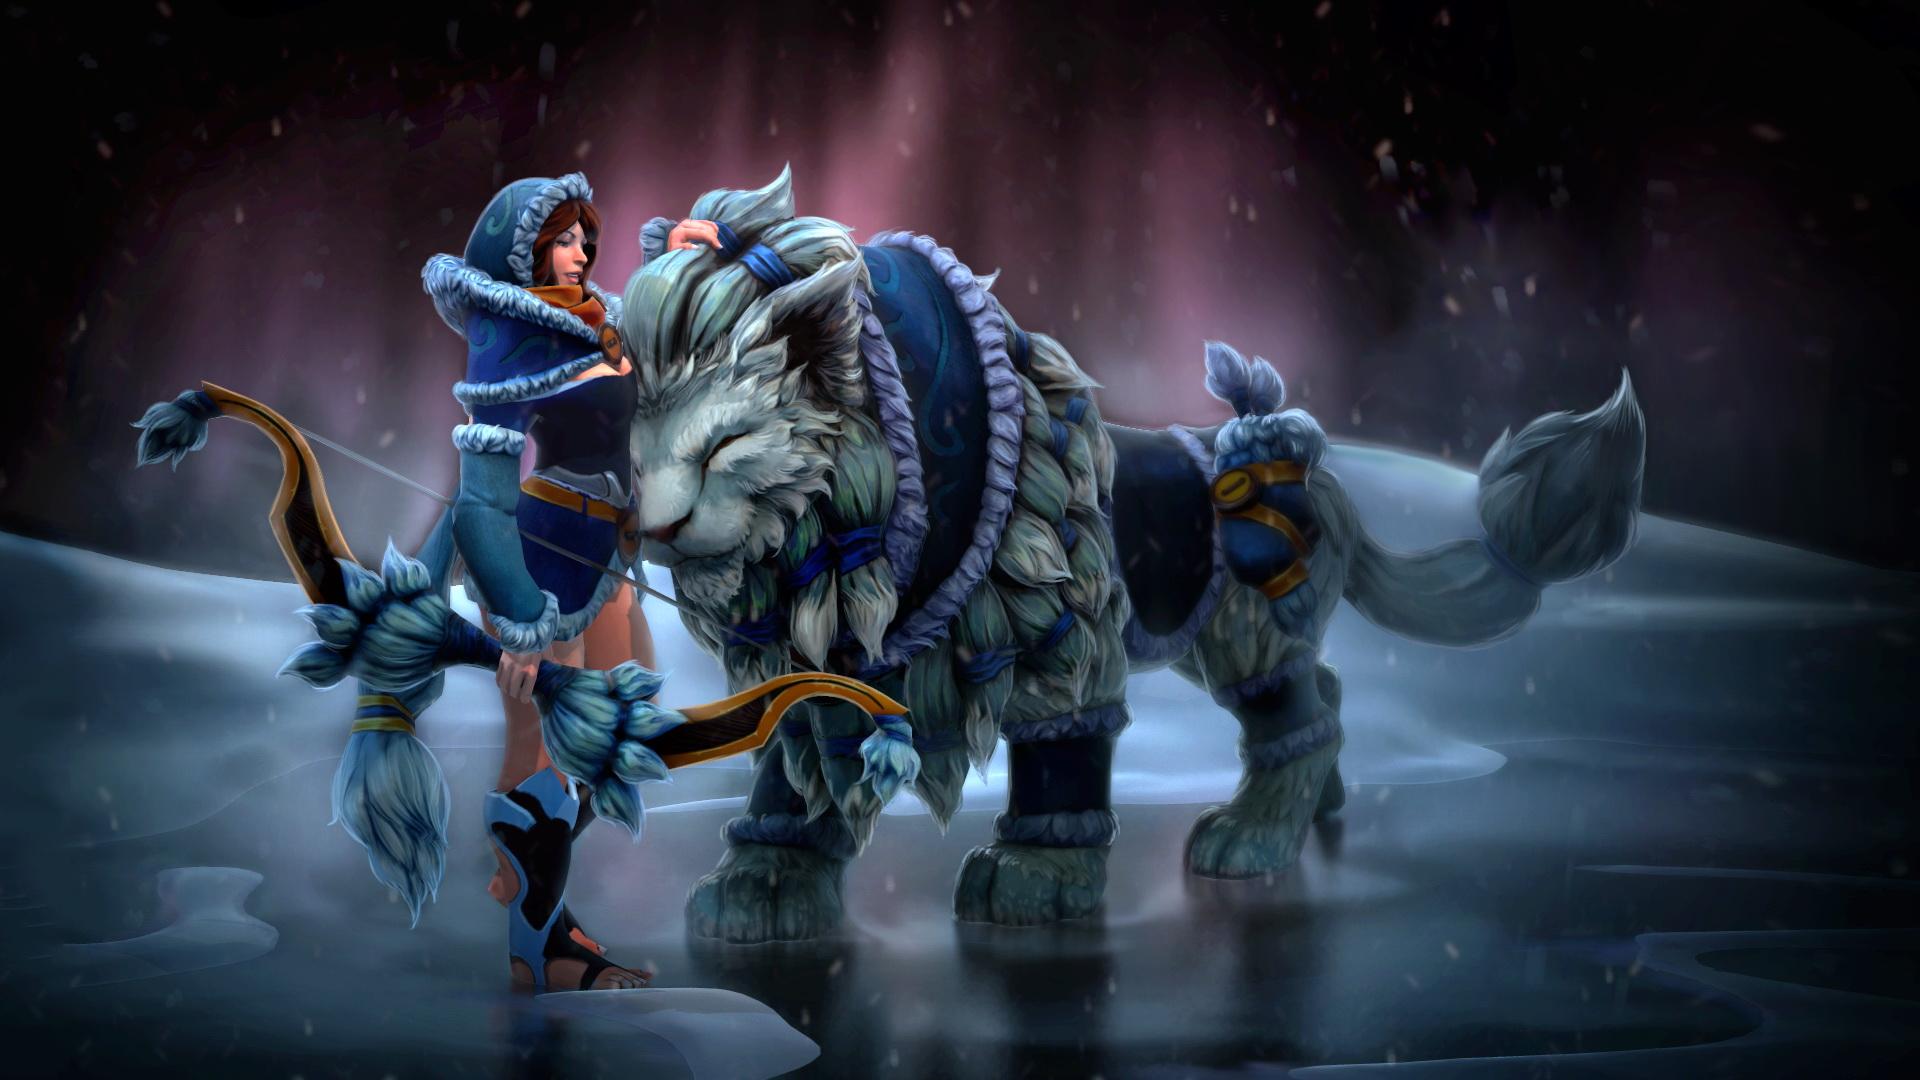 Mirana, Мирана Snowstorm Huntress Set обои на рабочий стол